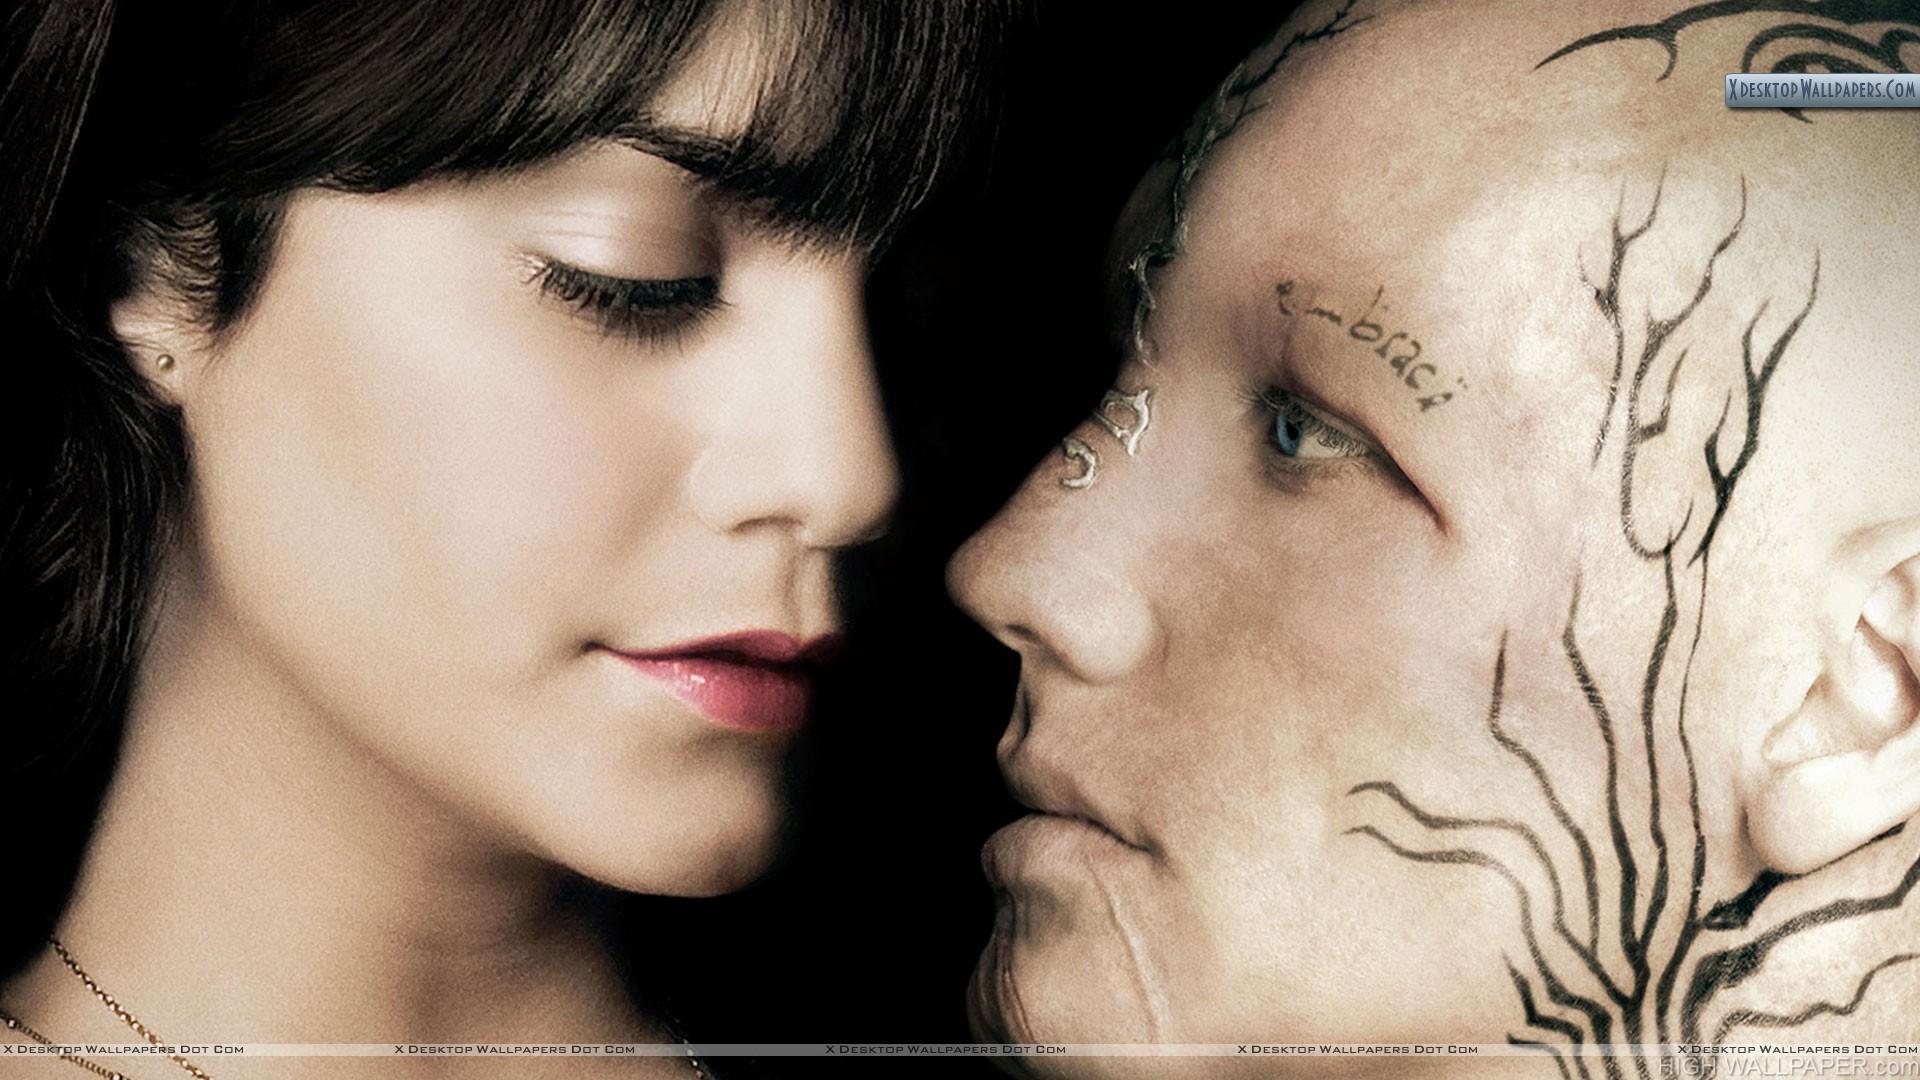 Vanessa Hudgens Face Closeup Kissing in Beastly HD Wallpaper 1920x1080